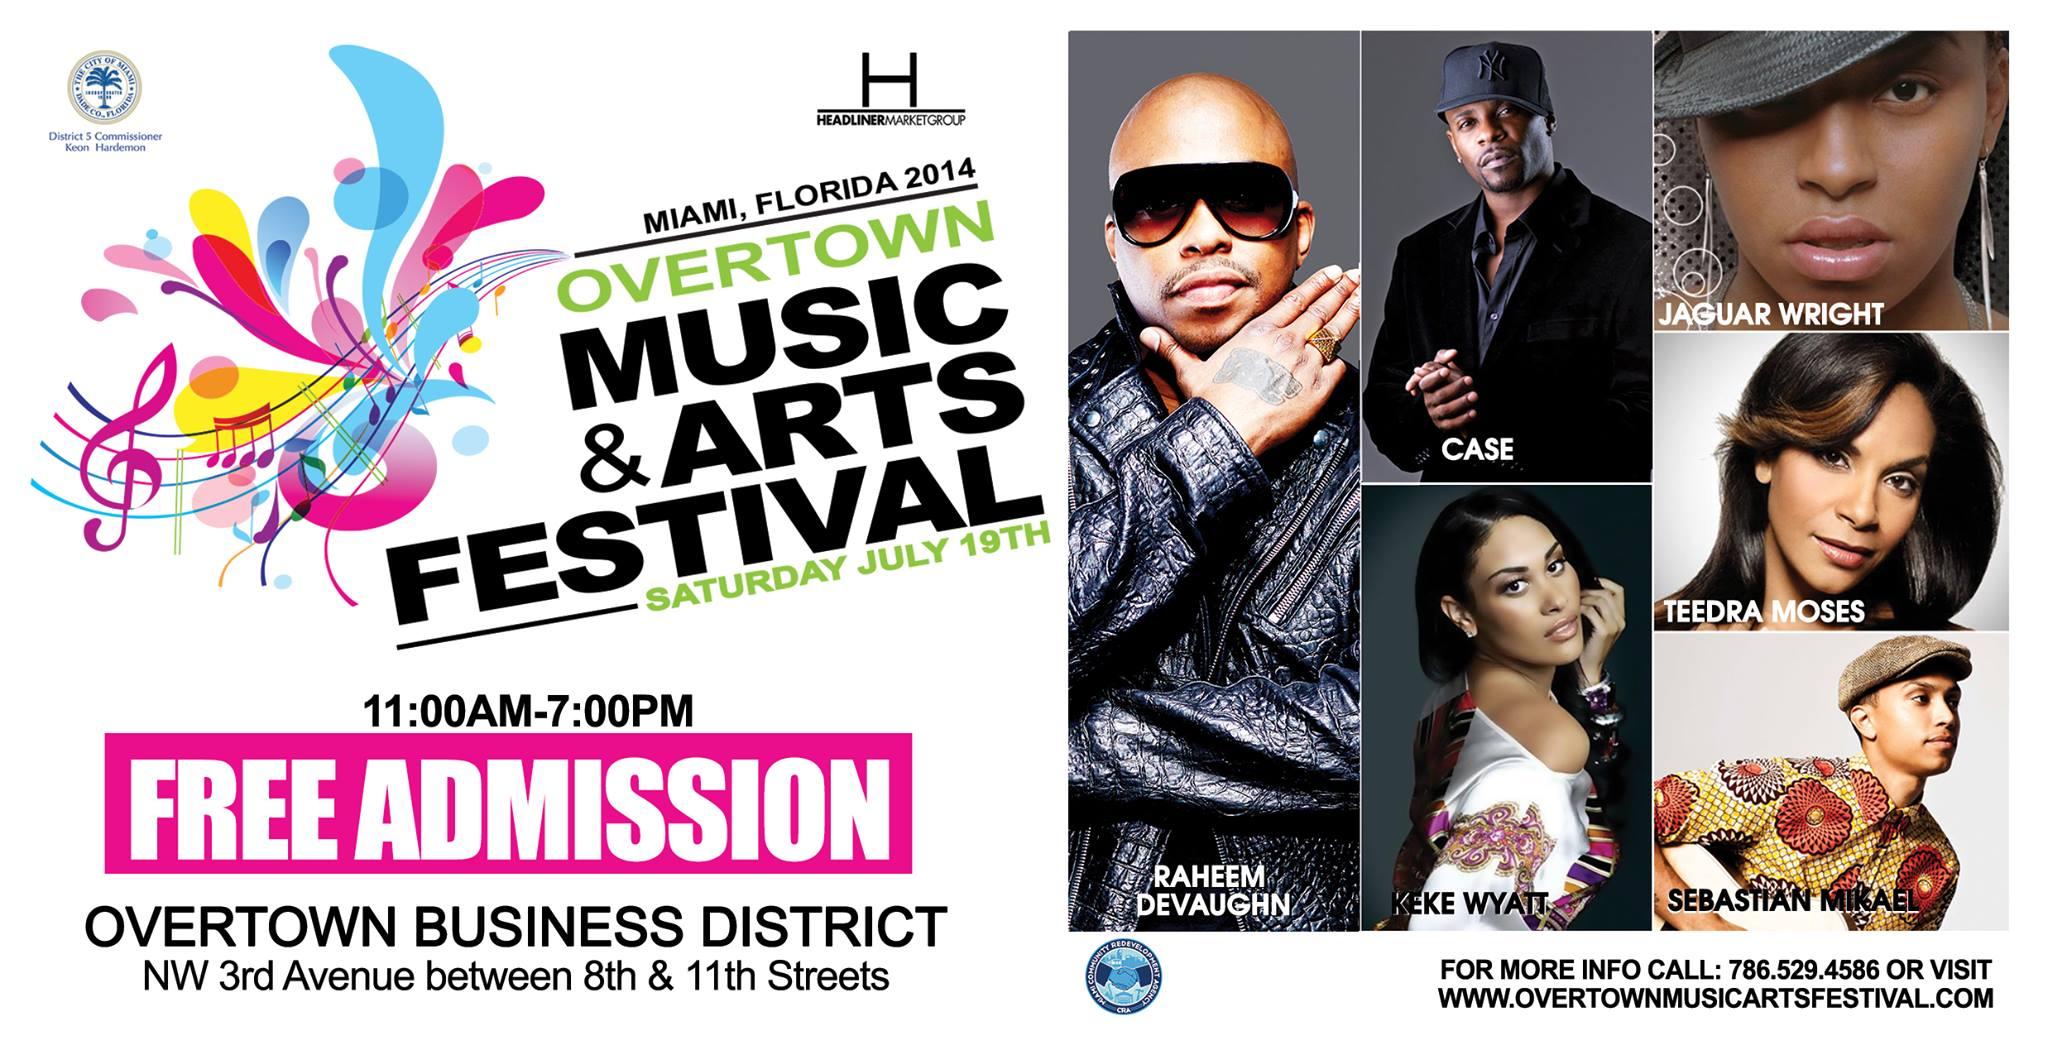 Overtown Music & Arts Festival - 2014